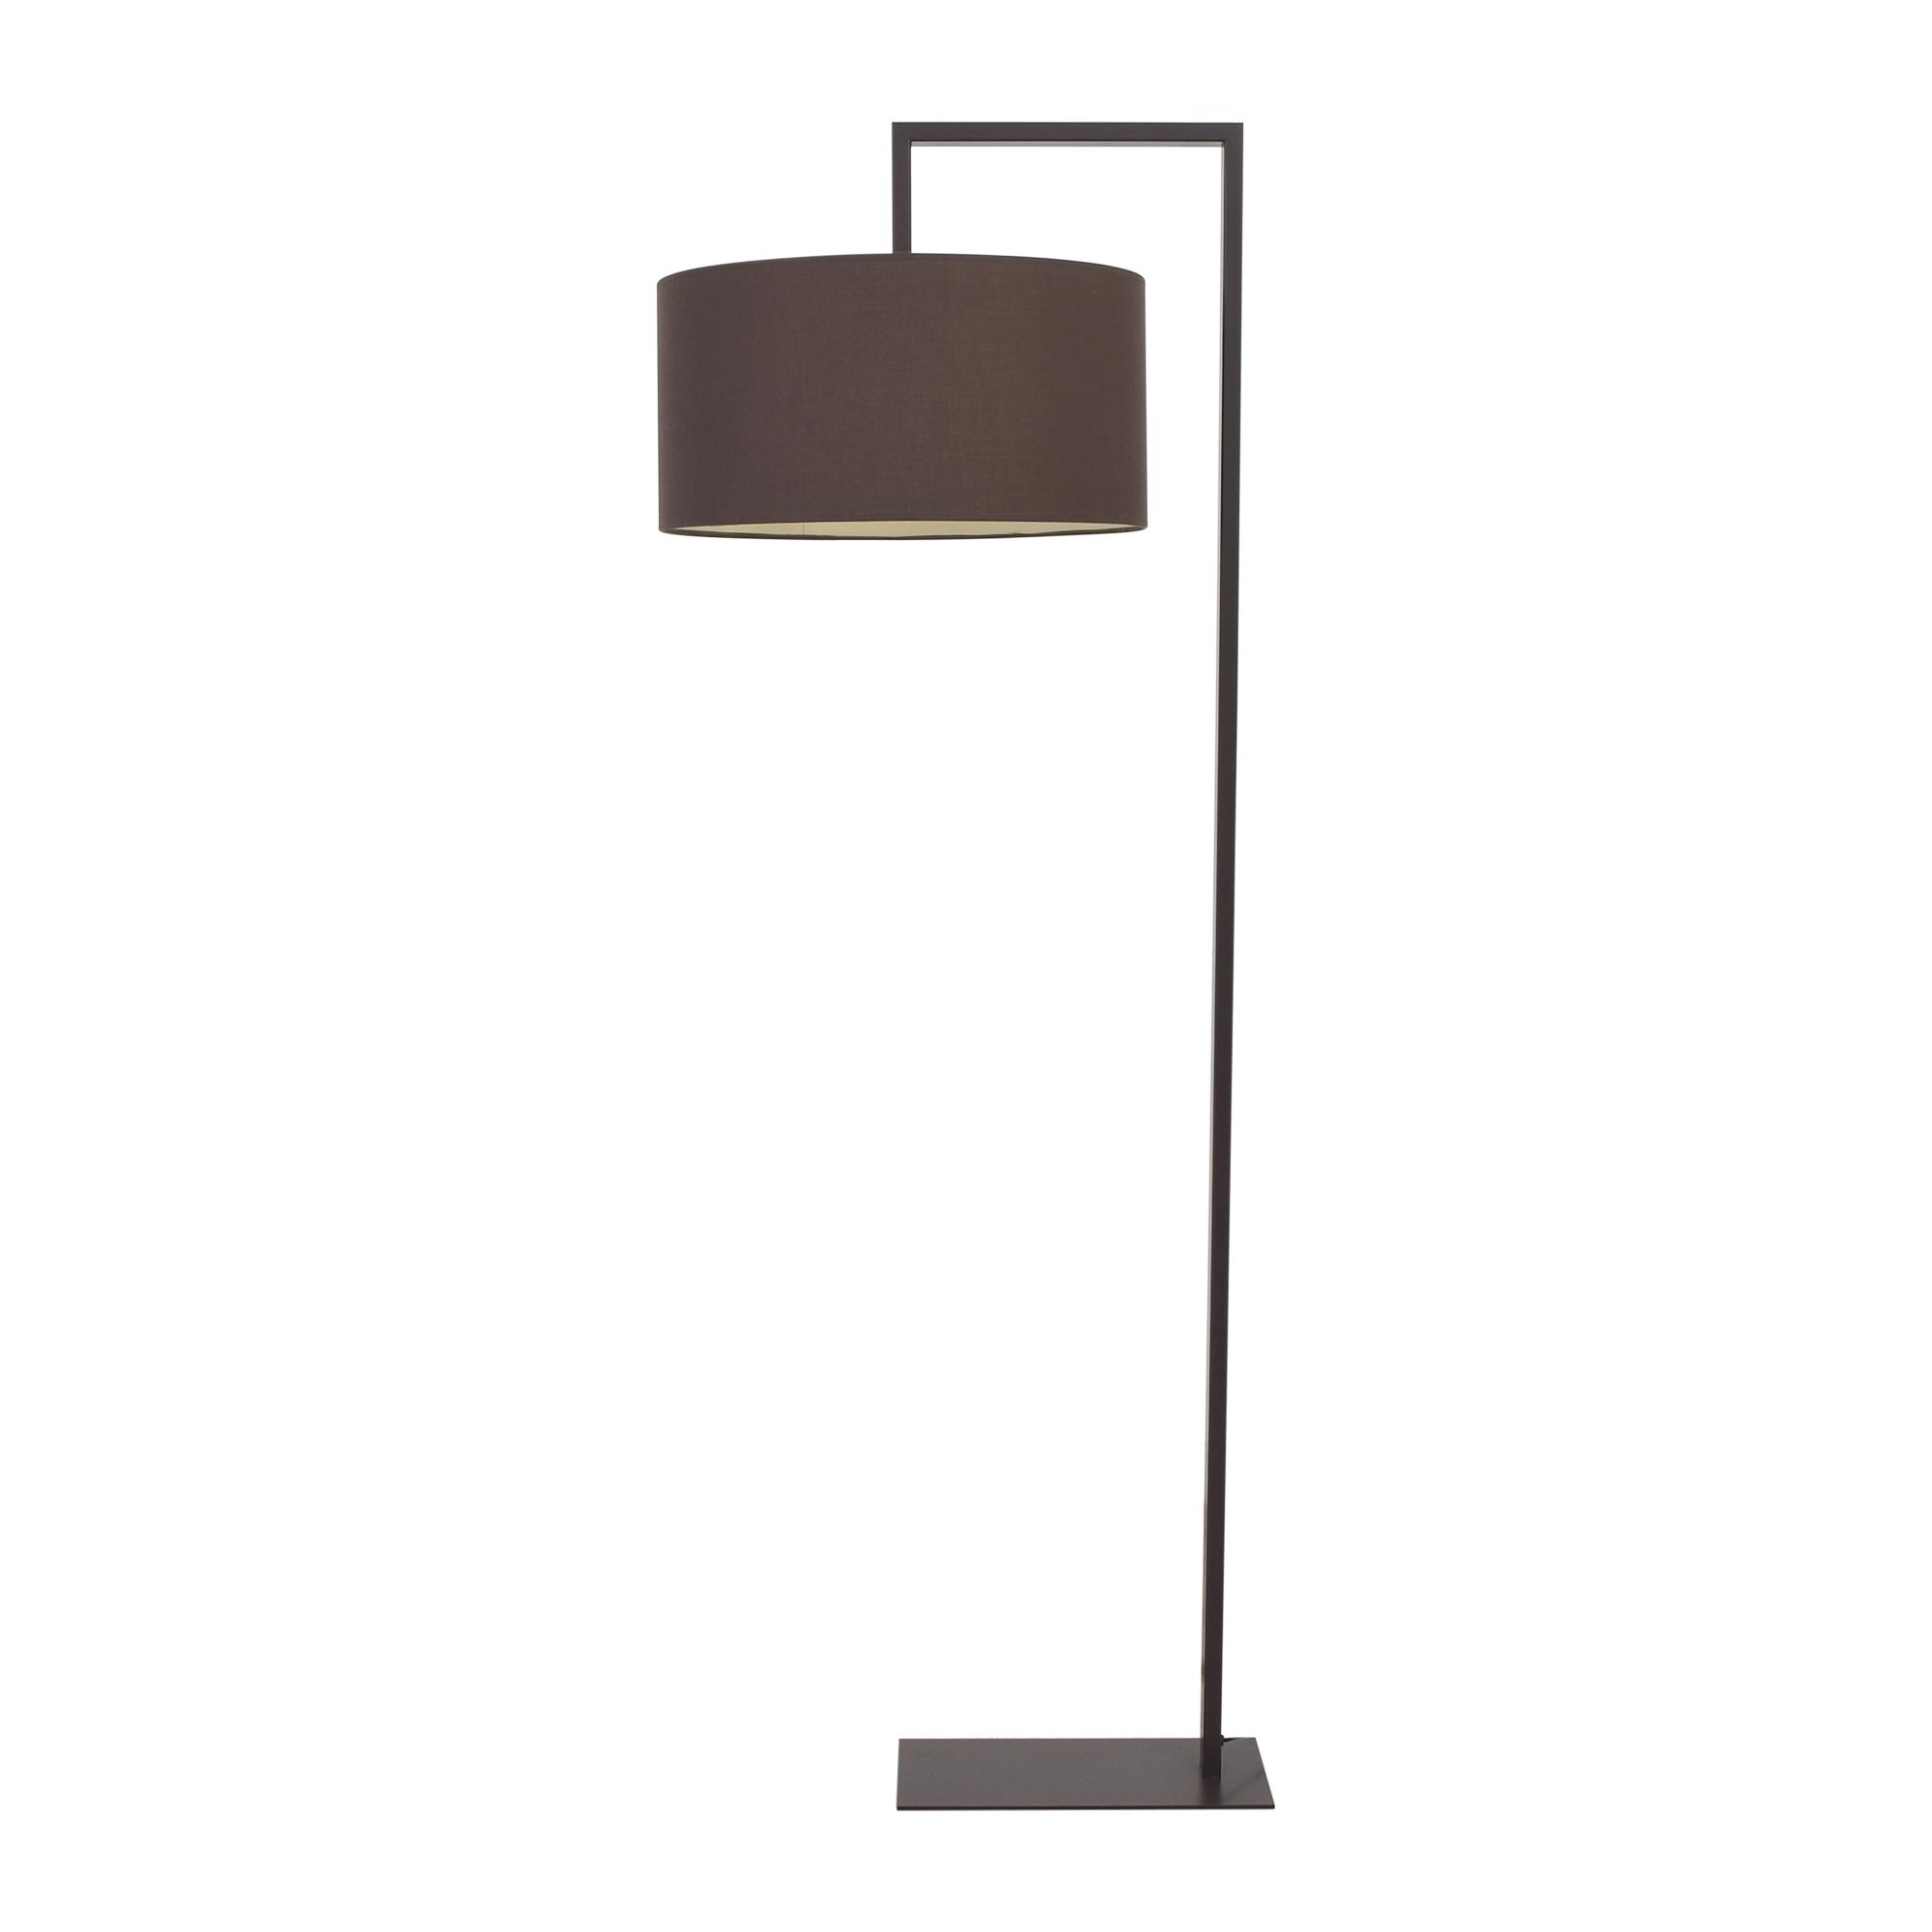 Roche Bobois Roche Bobois Les Heritiers Floor Lamp brown